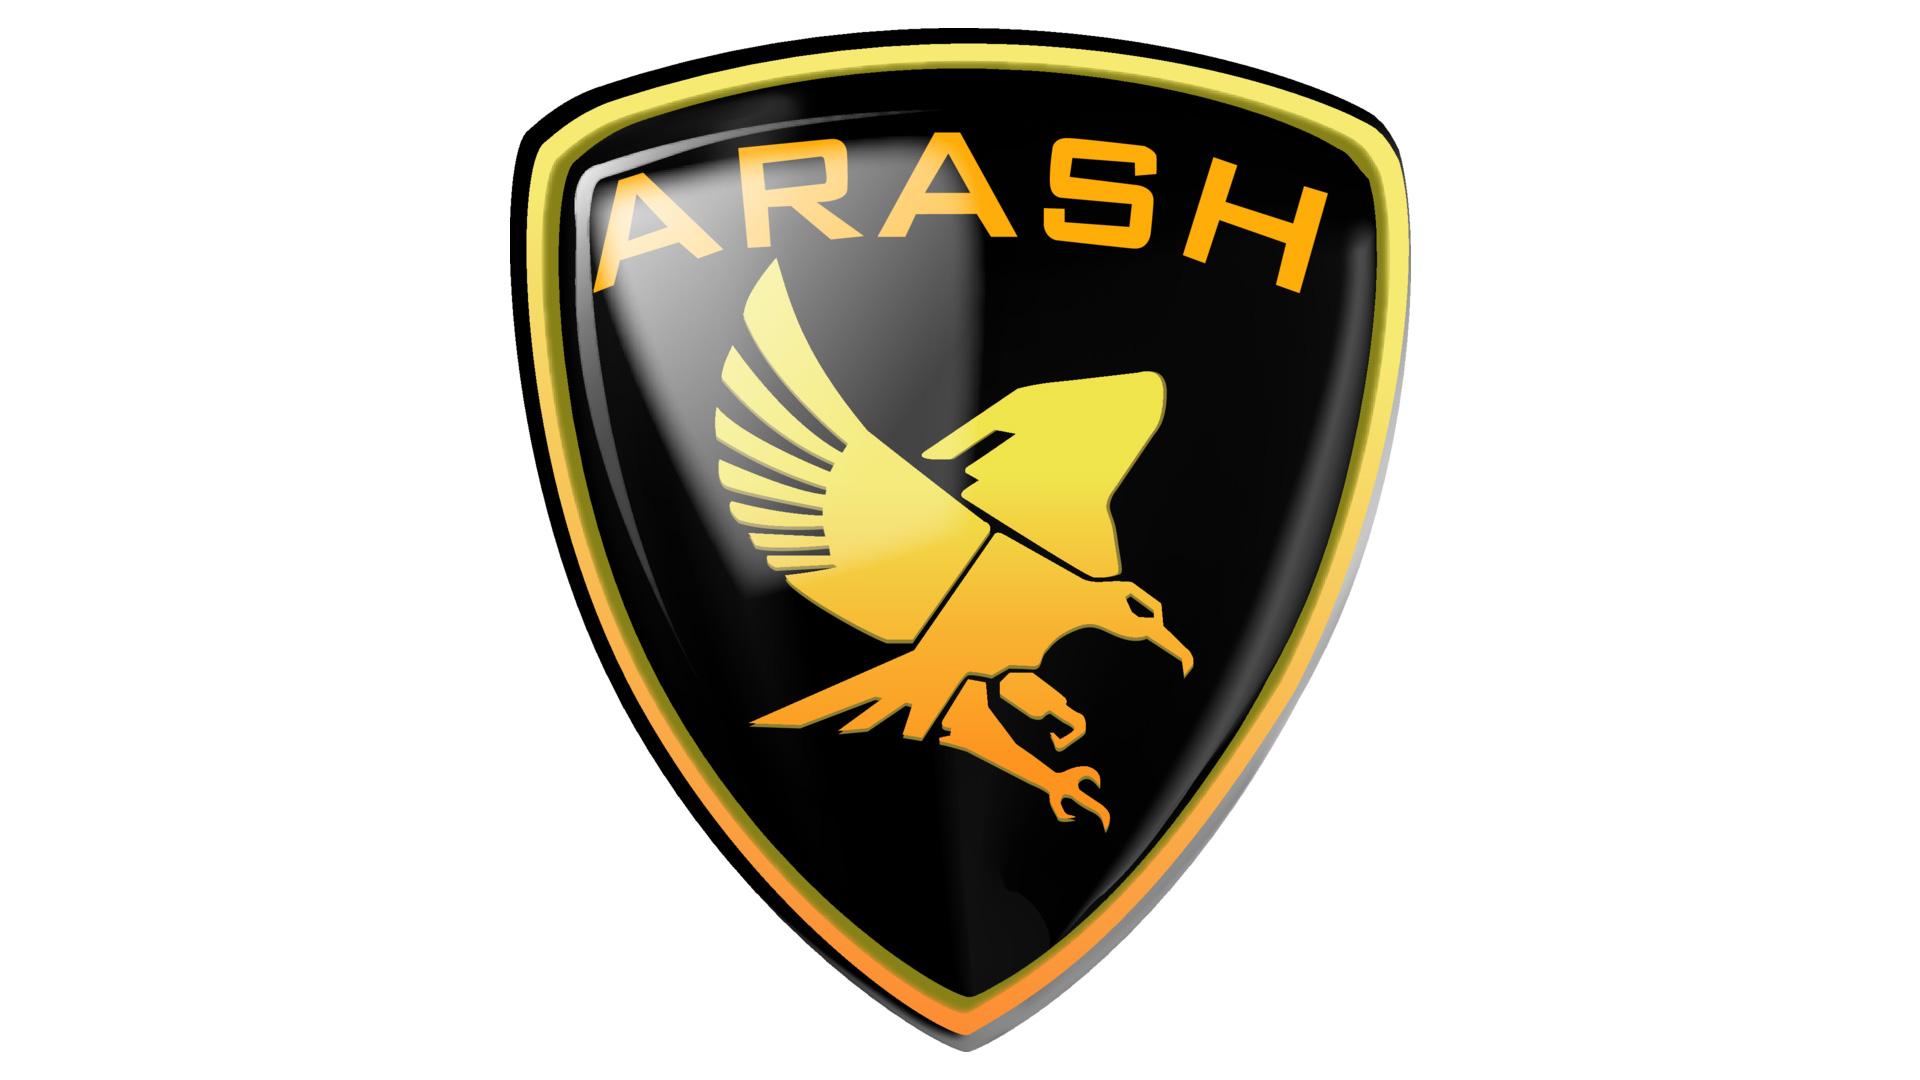 Arash-emblem